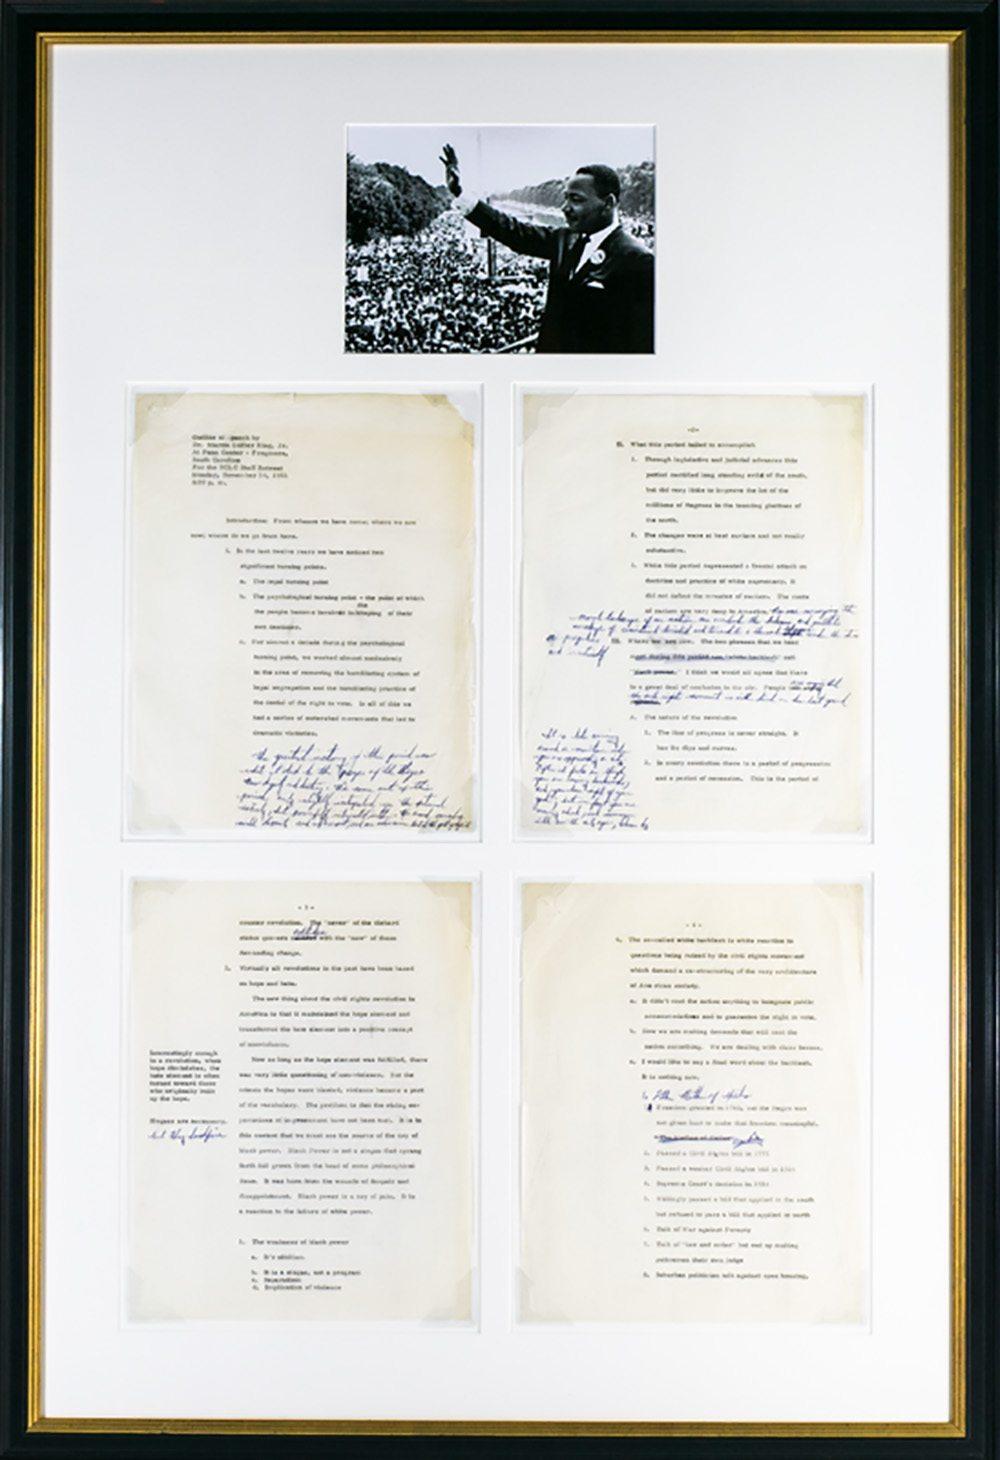 martin luther king signed speech speech of martin luther king jr 20067